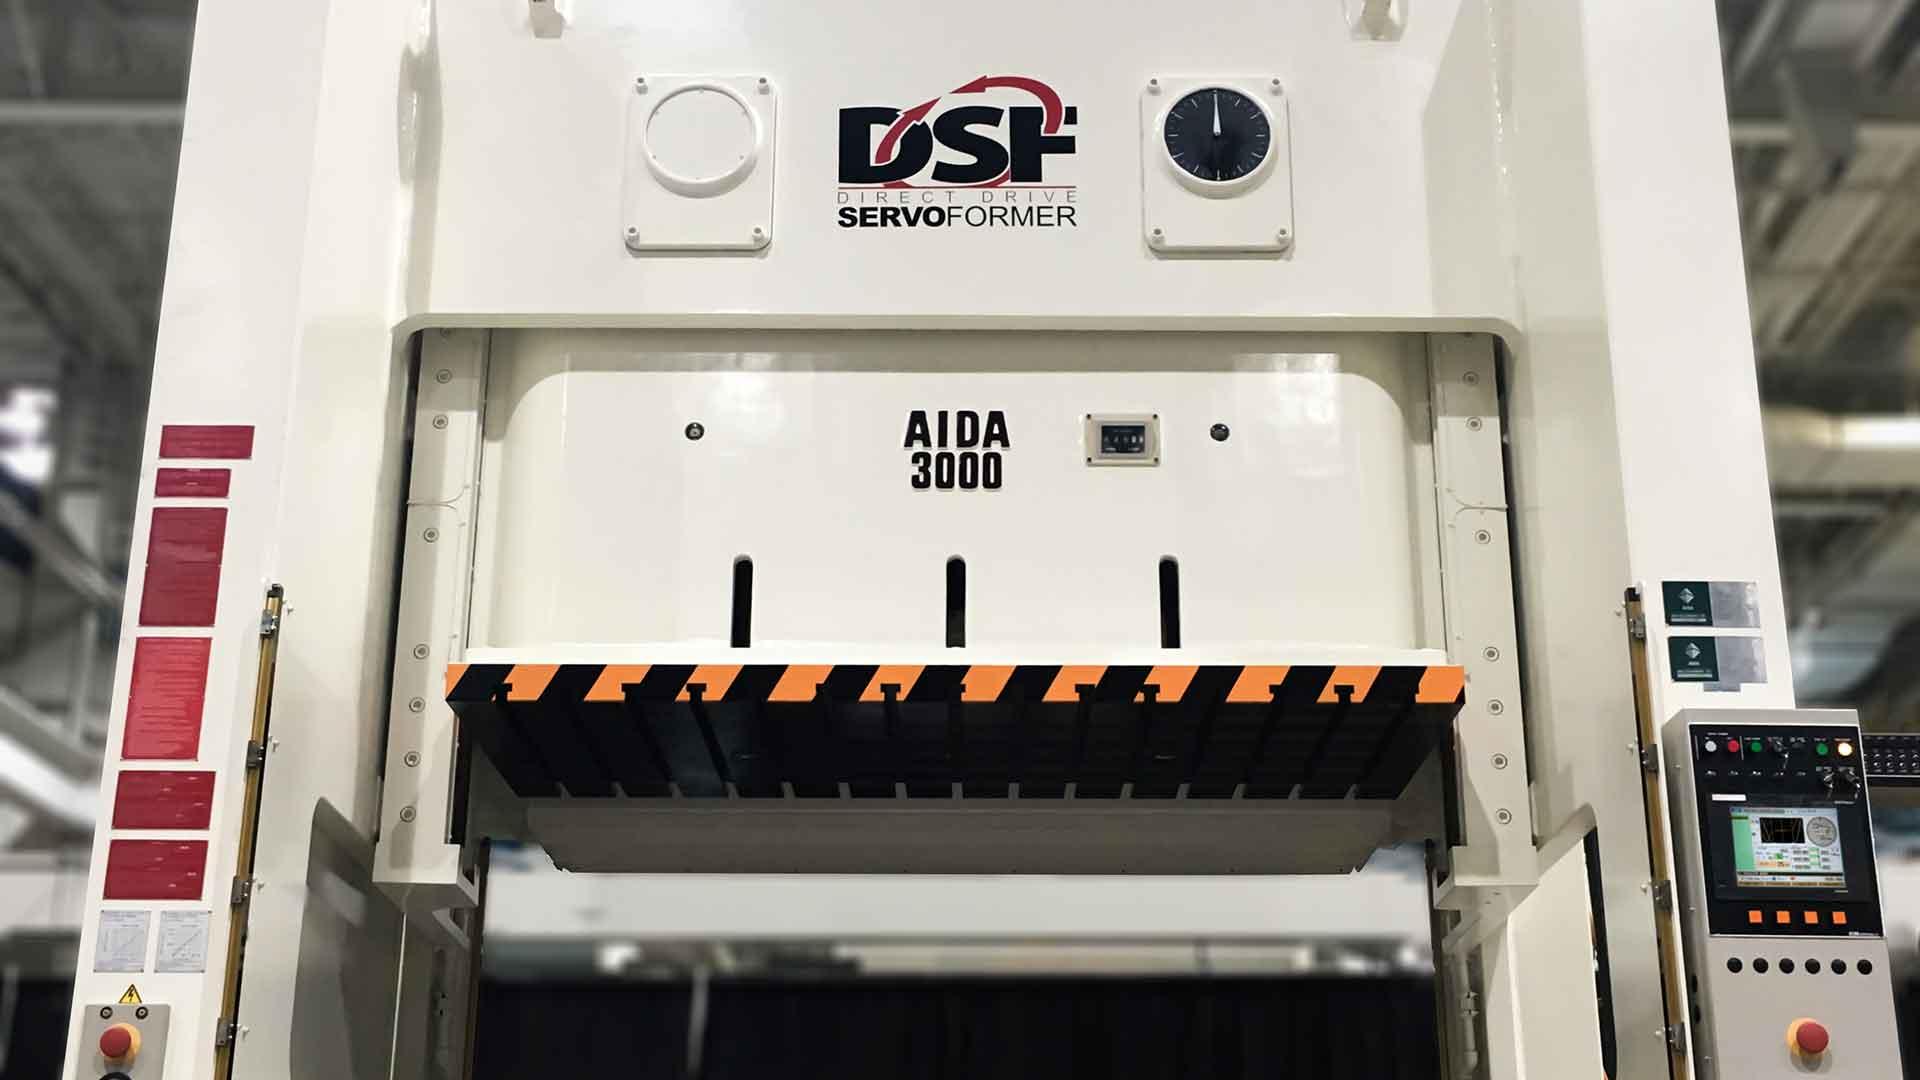 DSF-N2-3000, 300 Ton Unitized Frame Servo Press